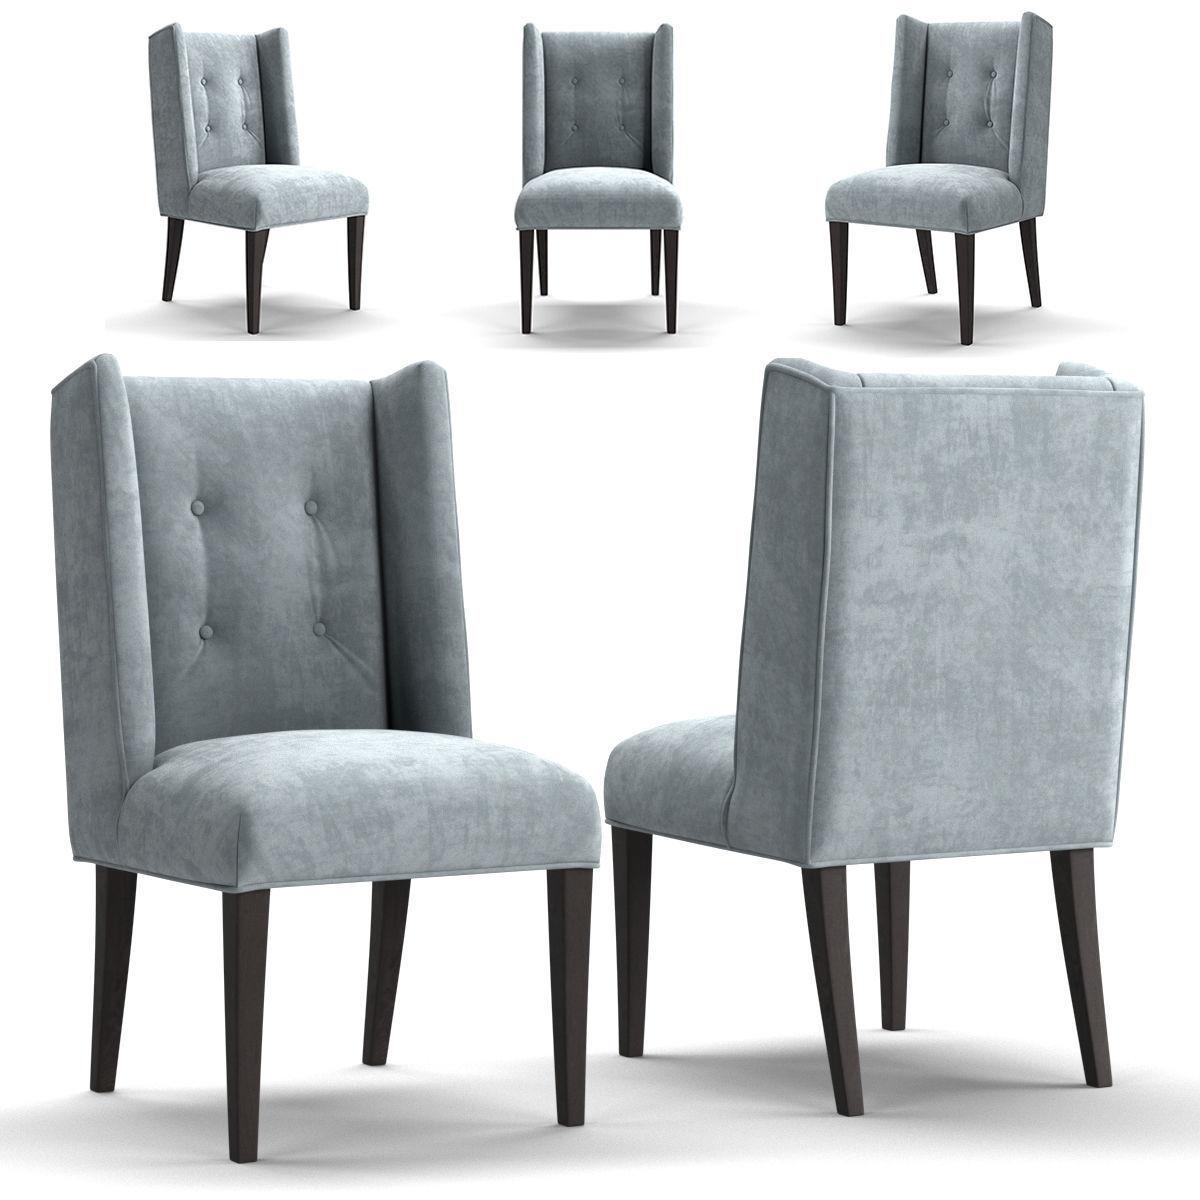 Arhaus Pike Dining Chair